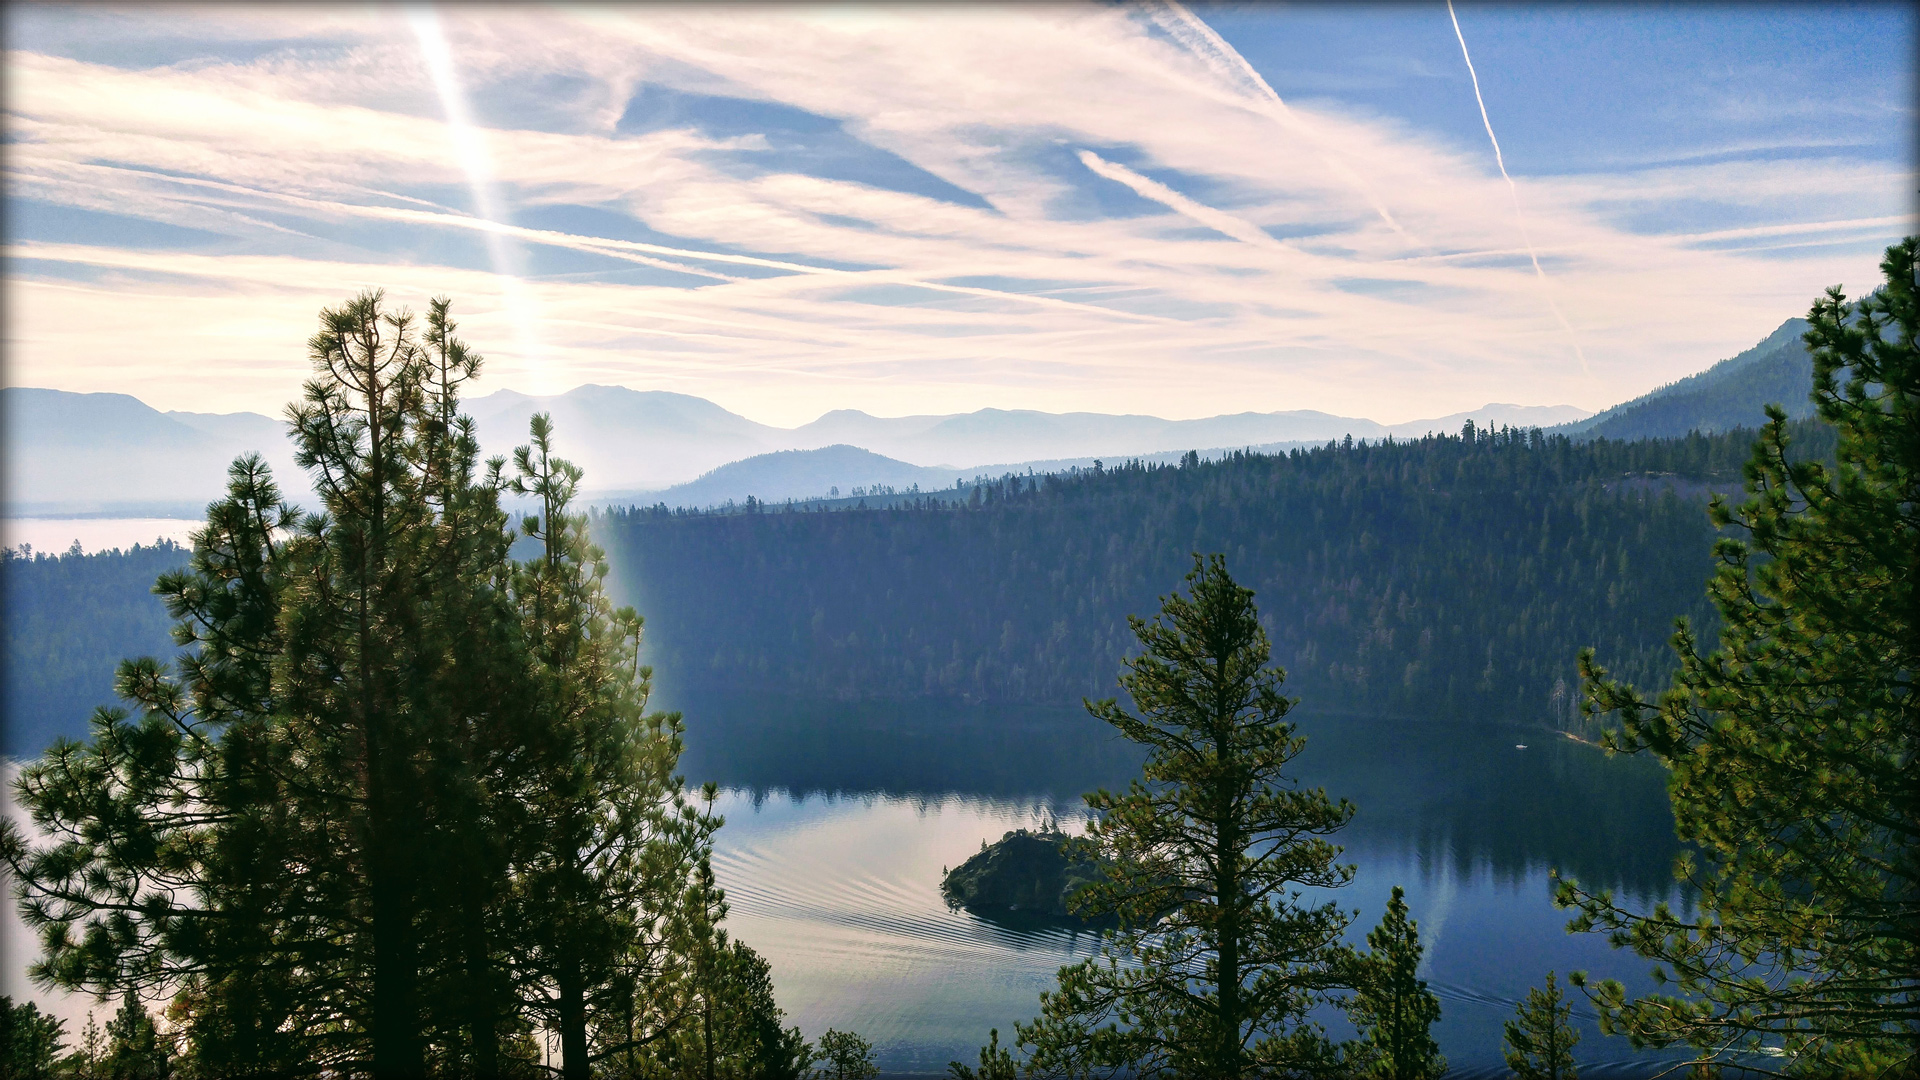 emerald_bay_lake_tahoe_california.jpg